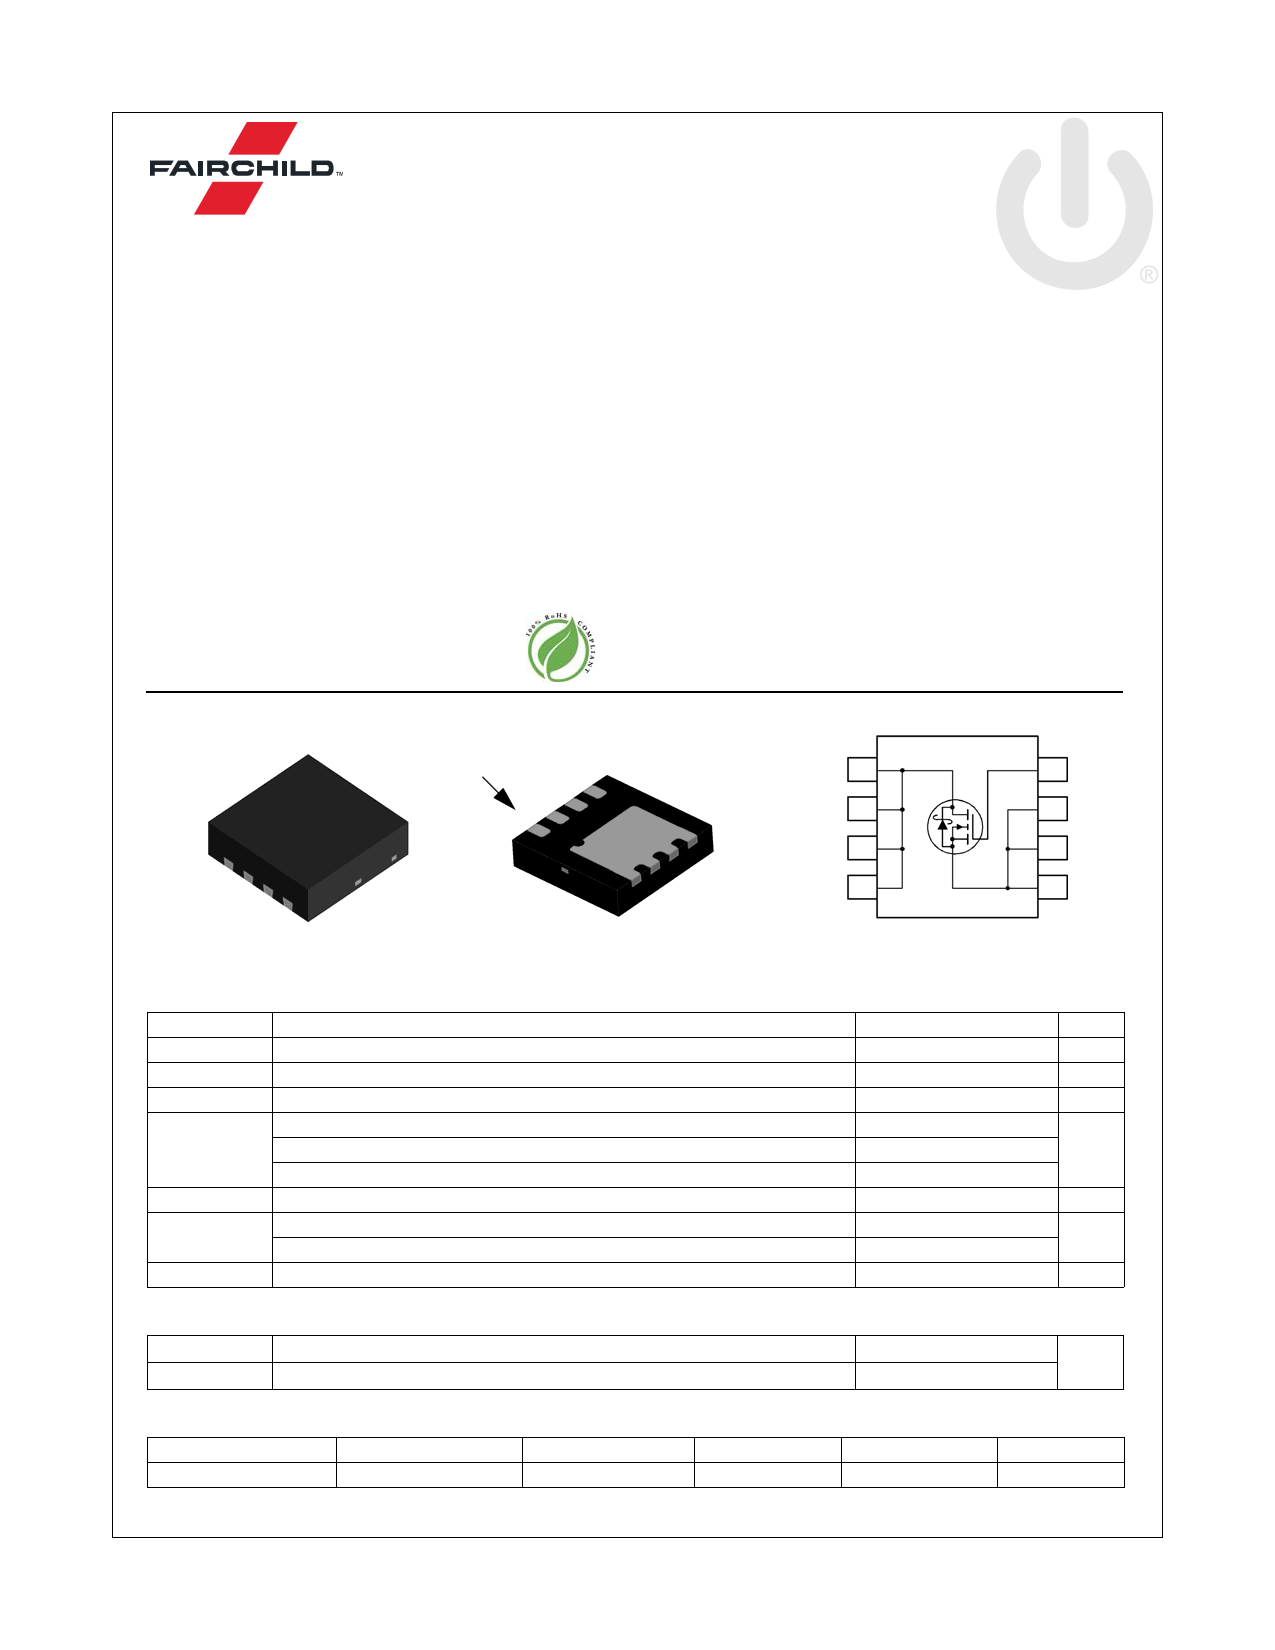 FDMC0310AS 데이터시트 및 FDMC0310AS PDF